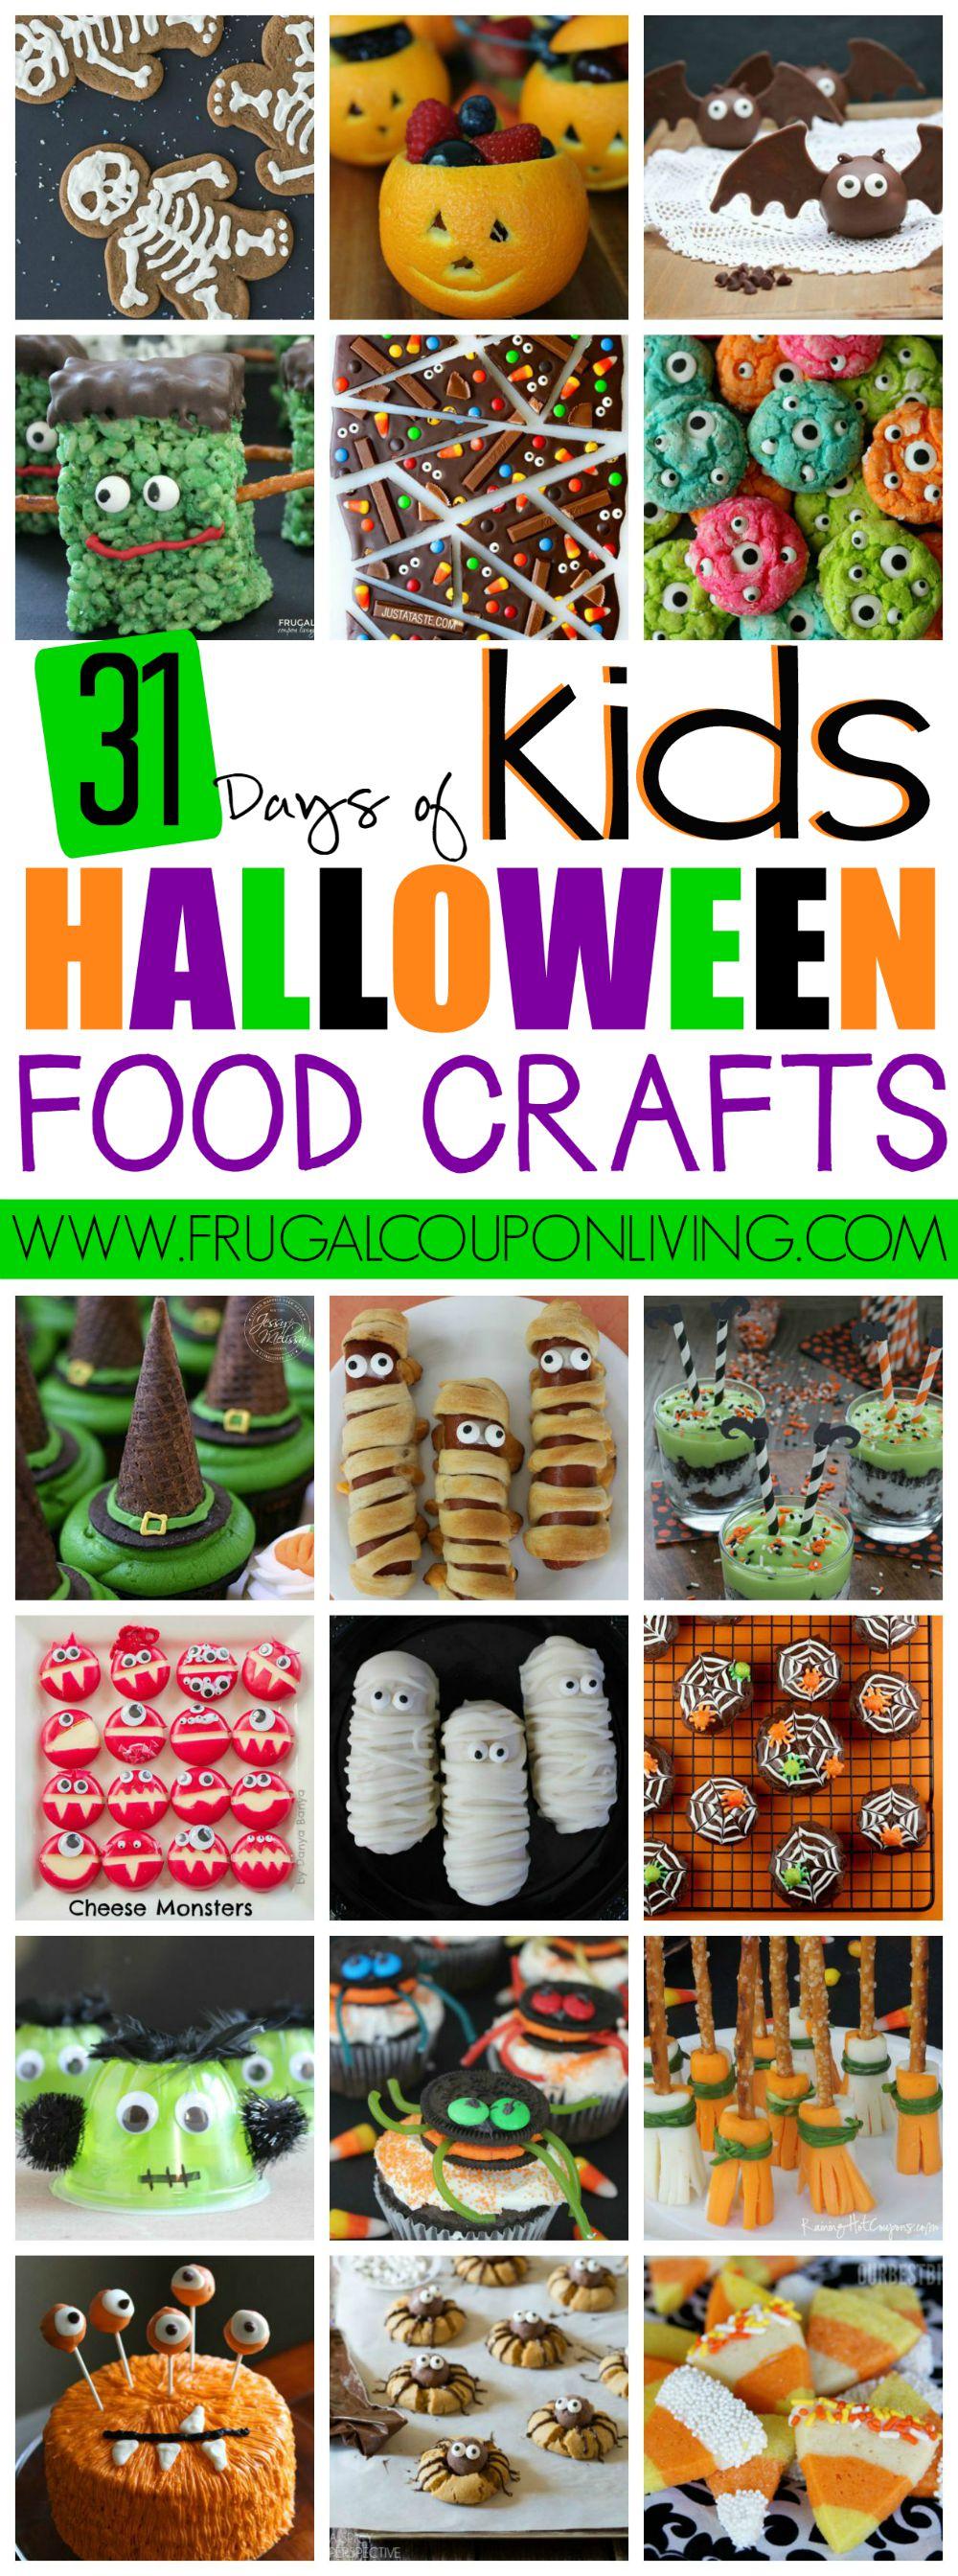 31+ days of kid's halloween food crafts